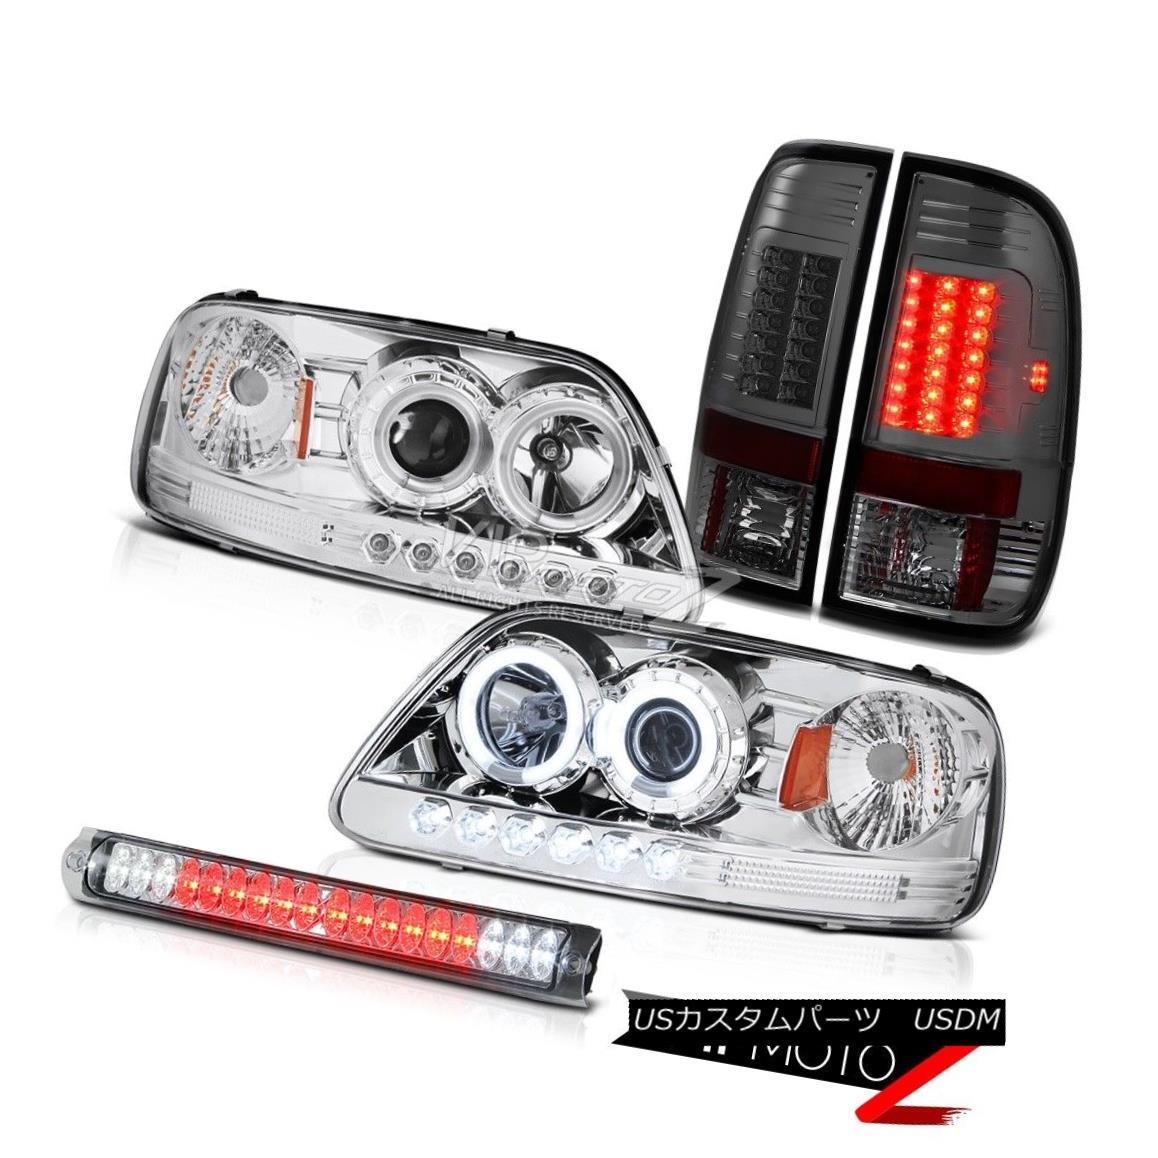 Lamp V6 Lamp Tinted ヘッドライト Chrome Halo Chrome F150 V6 1997 プロジェクターヘッドライトHalo 98 Ring LED Lights 98 Headlight Tail RingテールライトLED 1997 F150 Tinted Projector